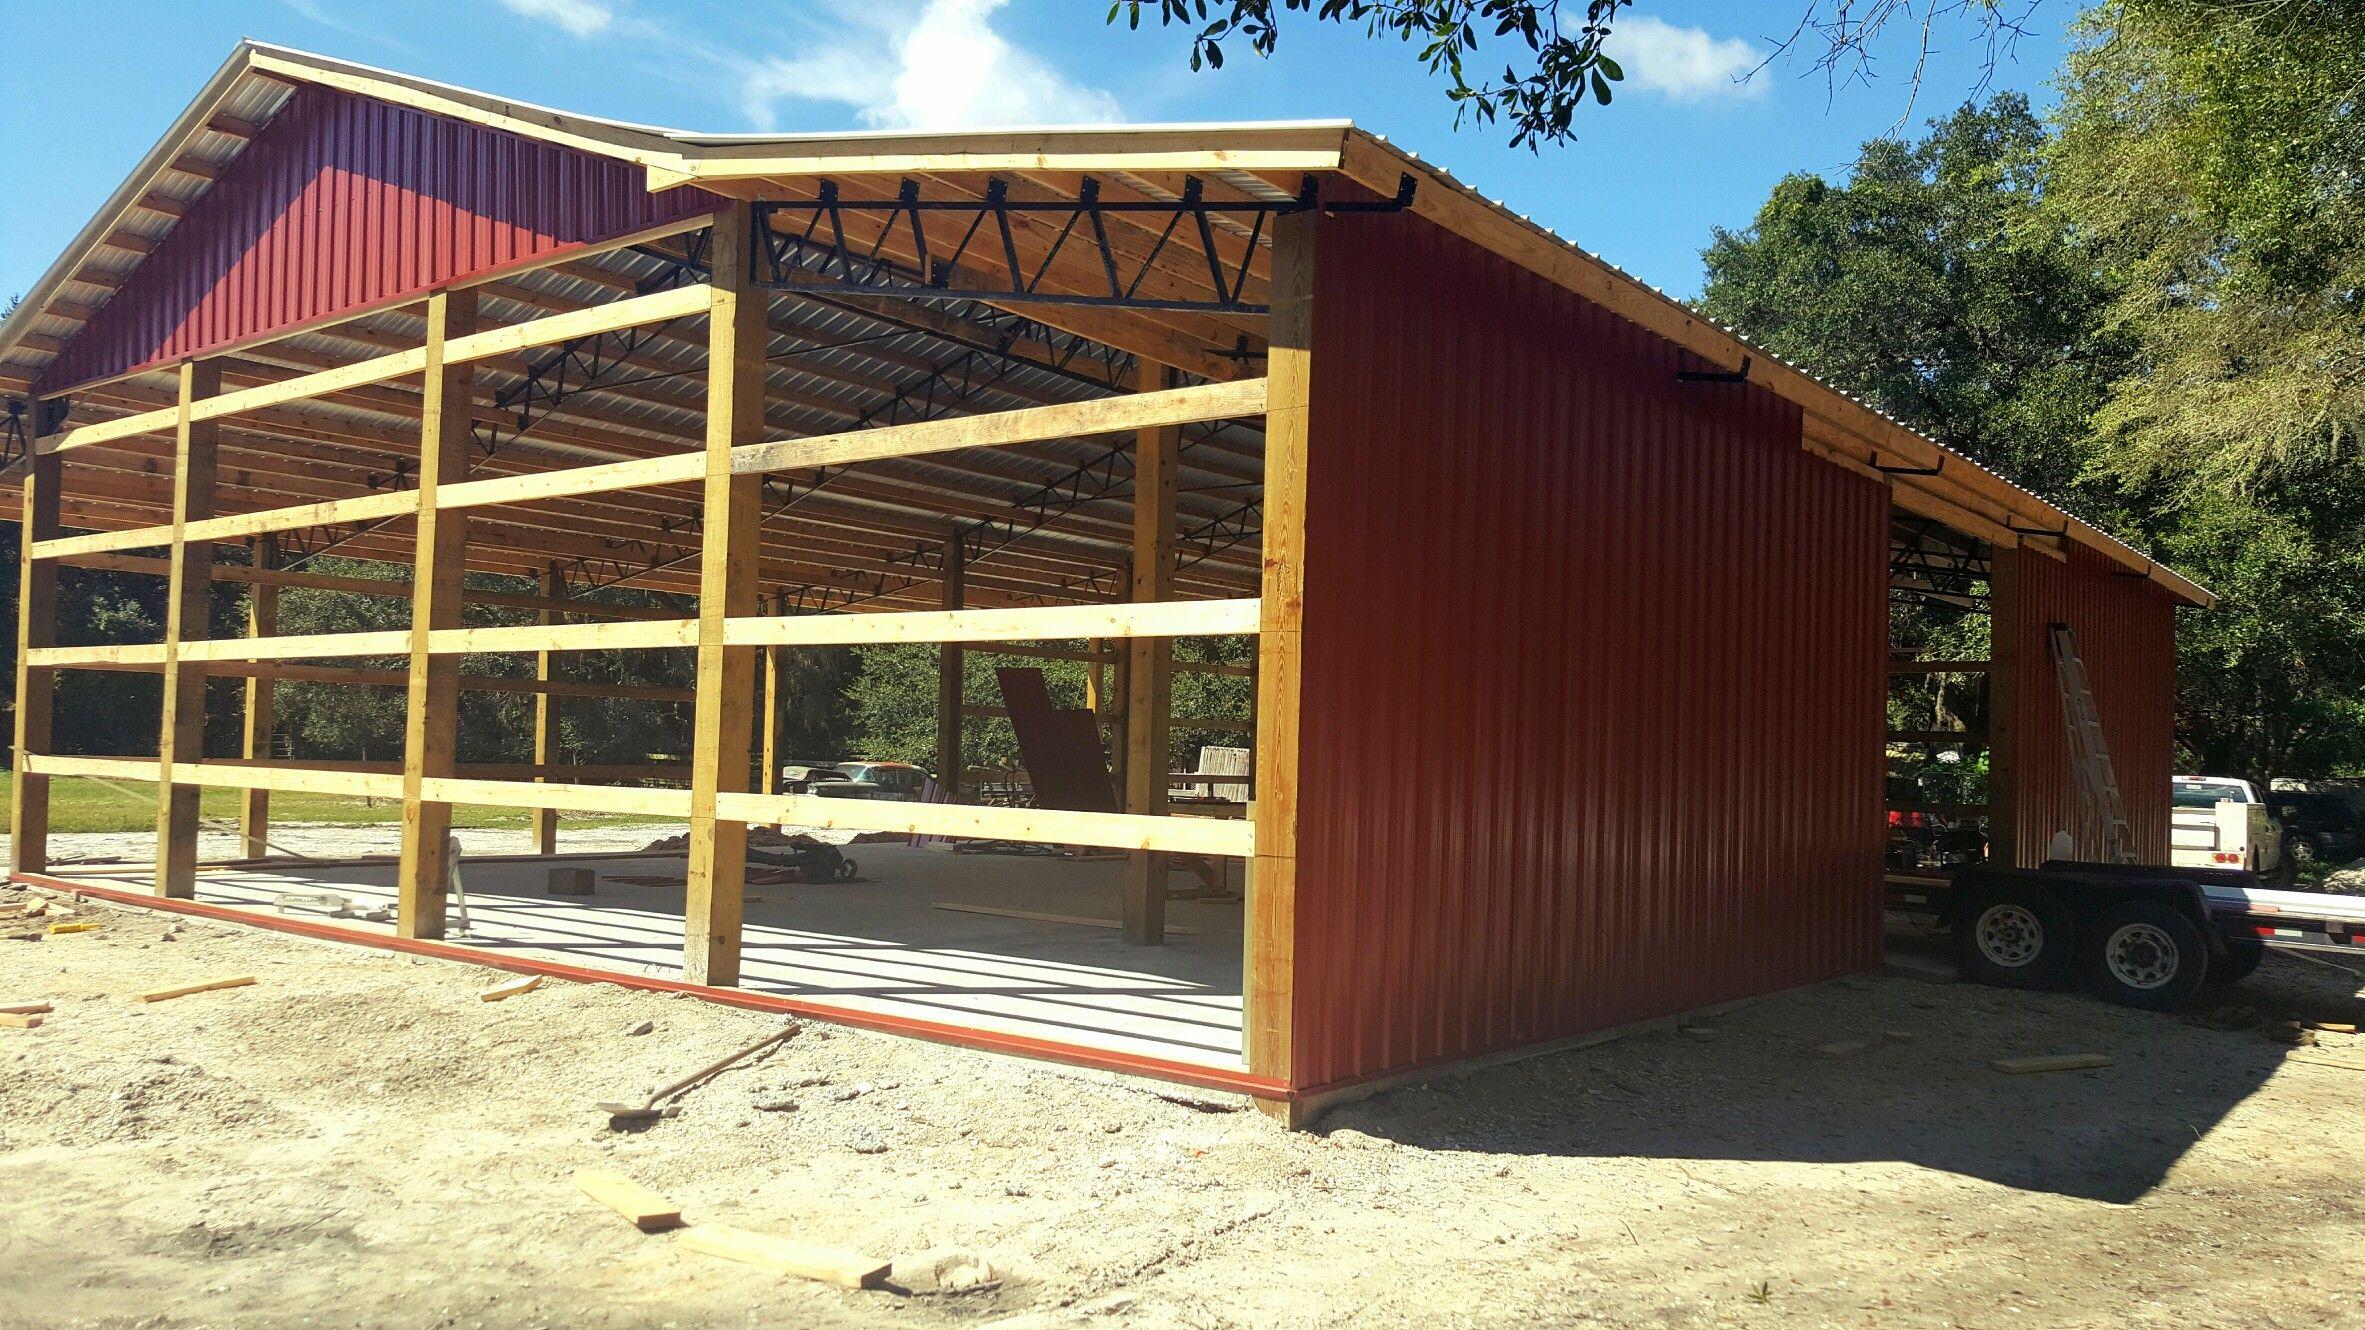 designing builders your pole now buildings post berkey frame barn building licenced barns start mallett alabama